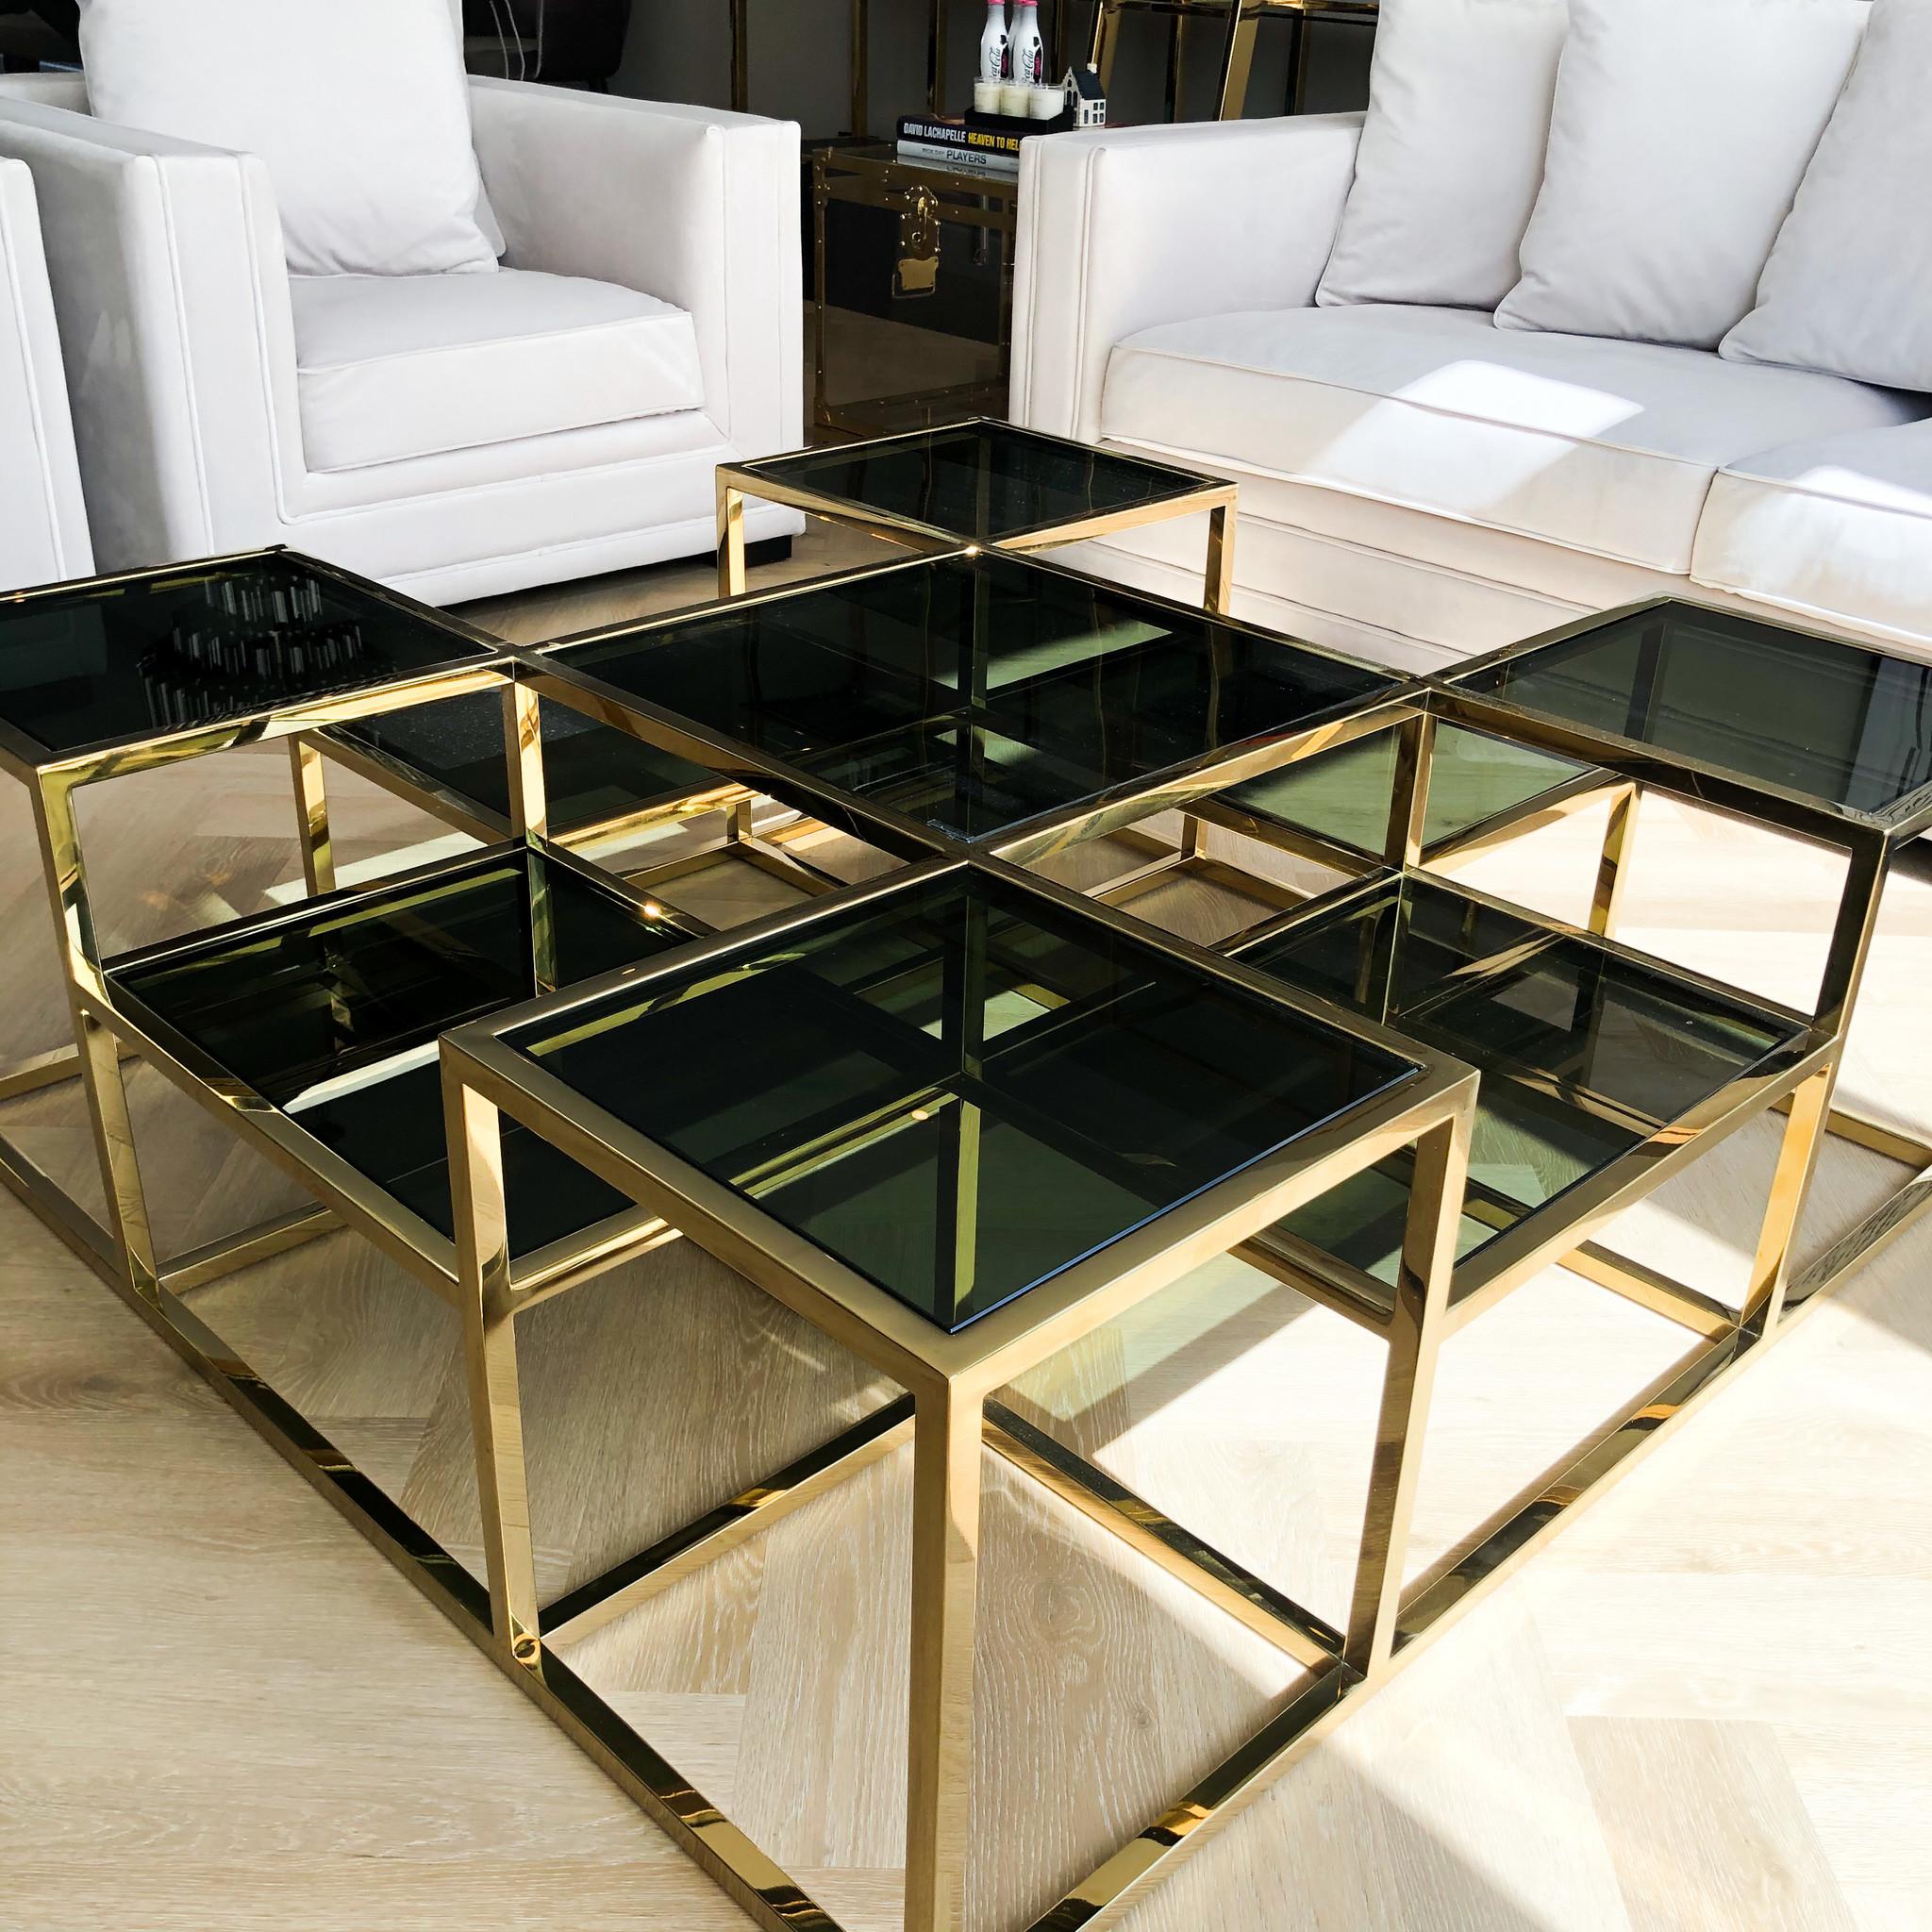 Design Coffee Table Astoria Gold-5